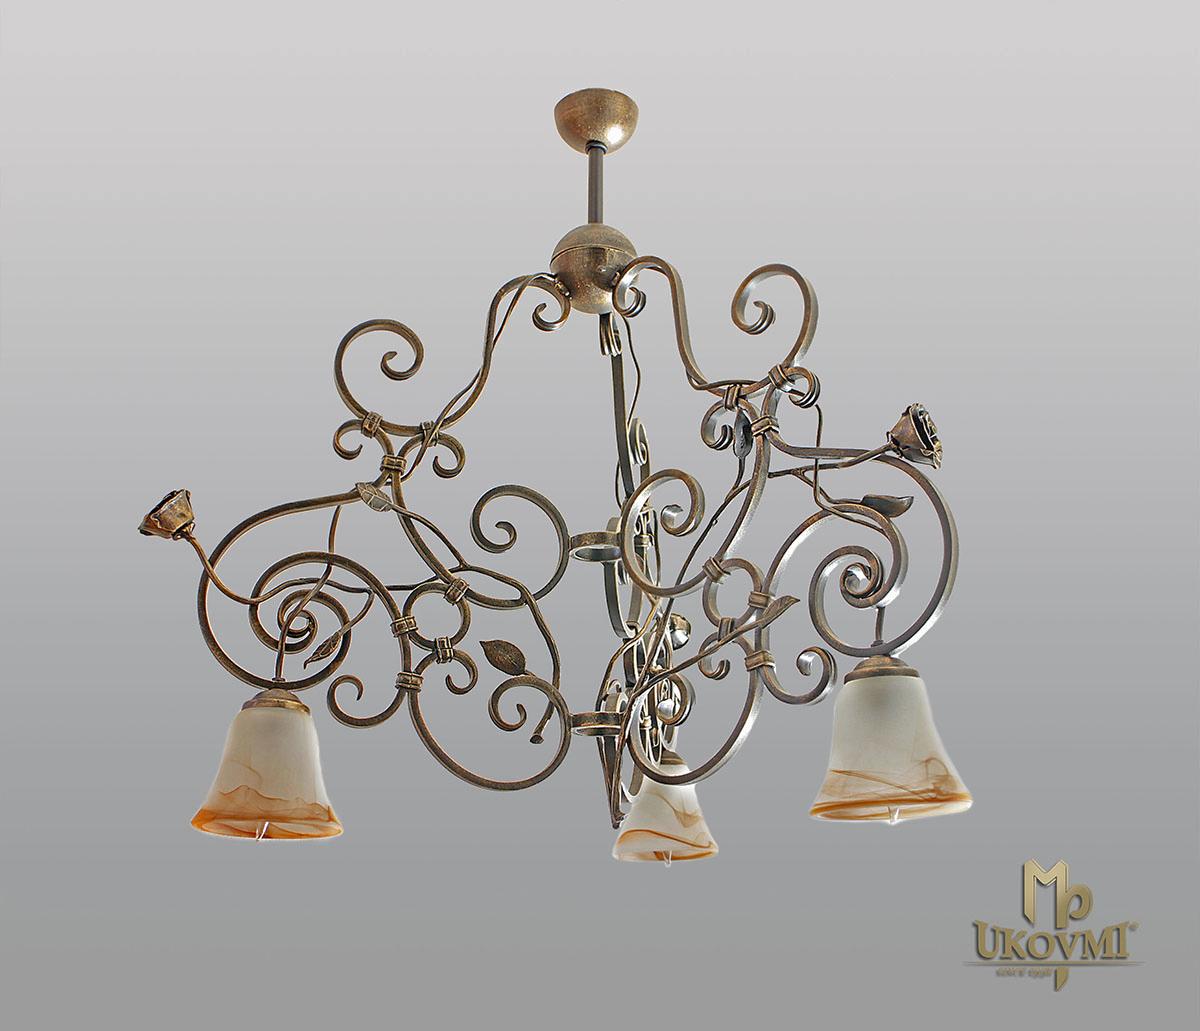 Závesné svietidlo – kovaný luster – RUSTIKÁL 3 - interiérové svietidlo